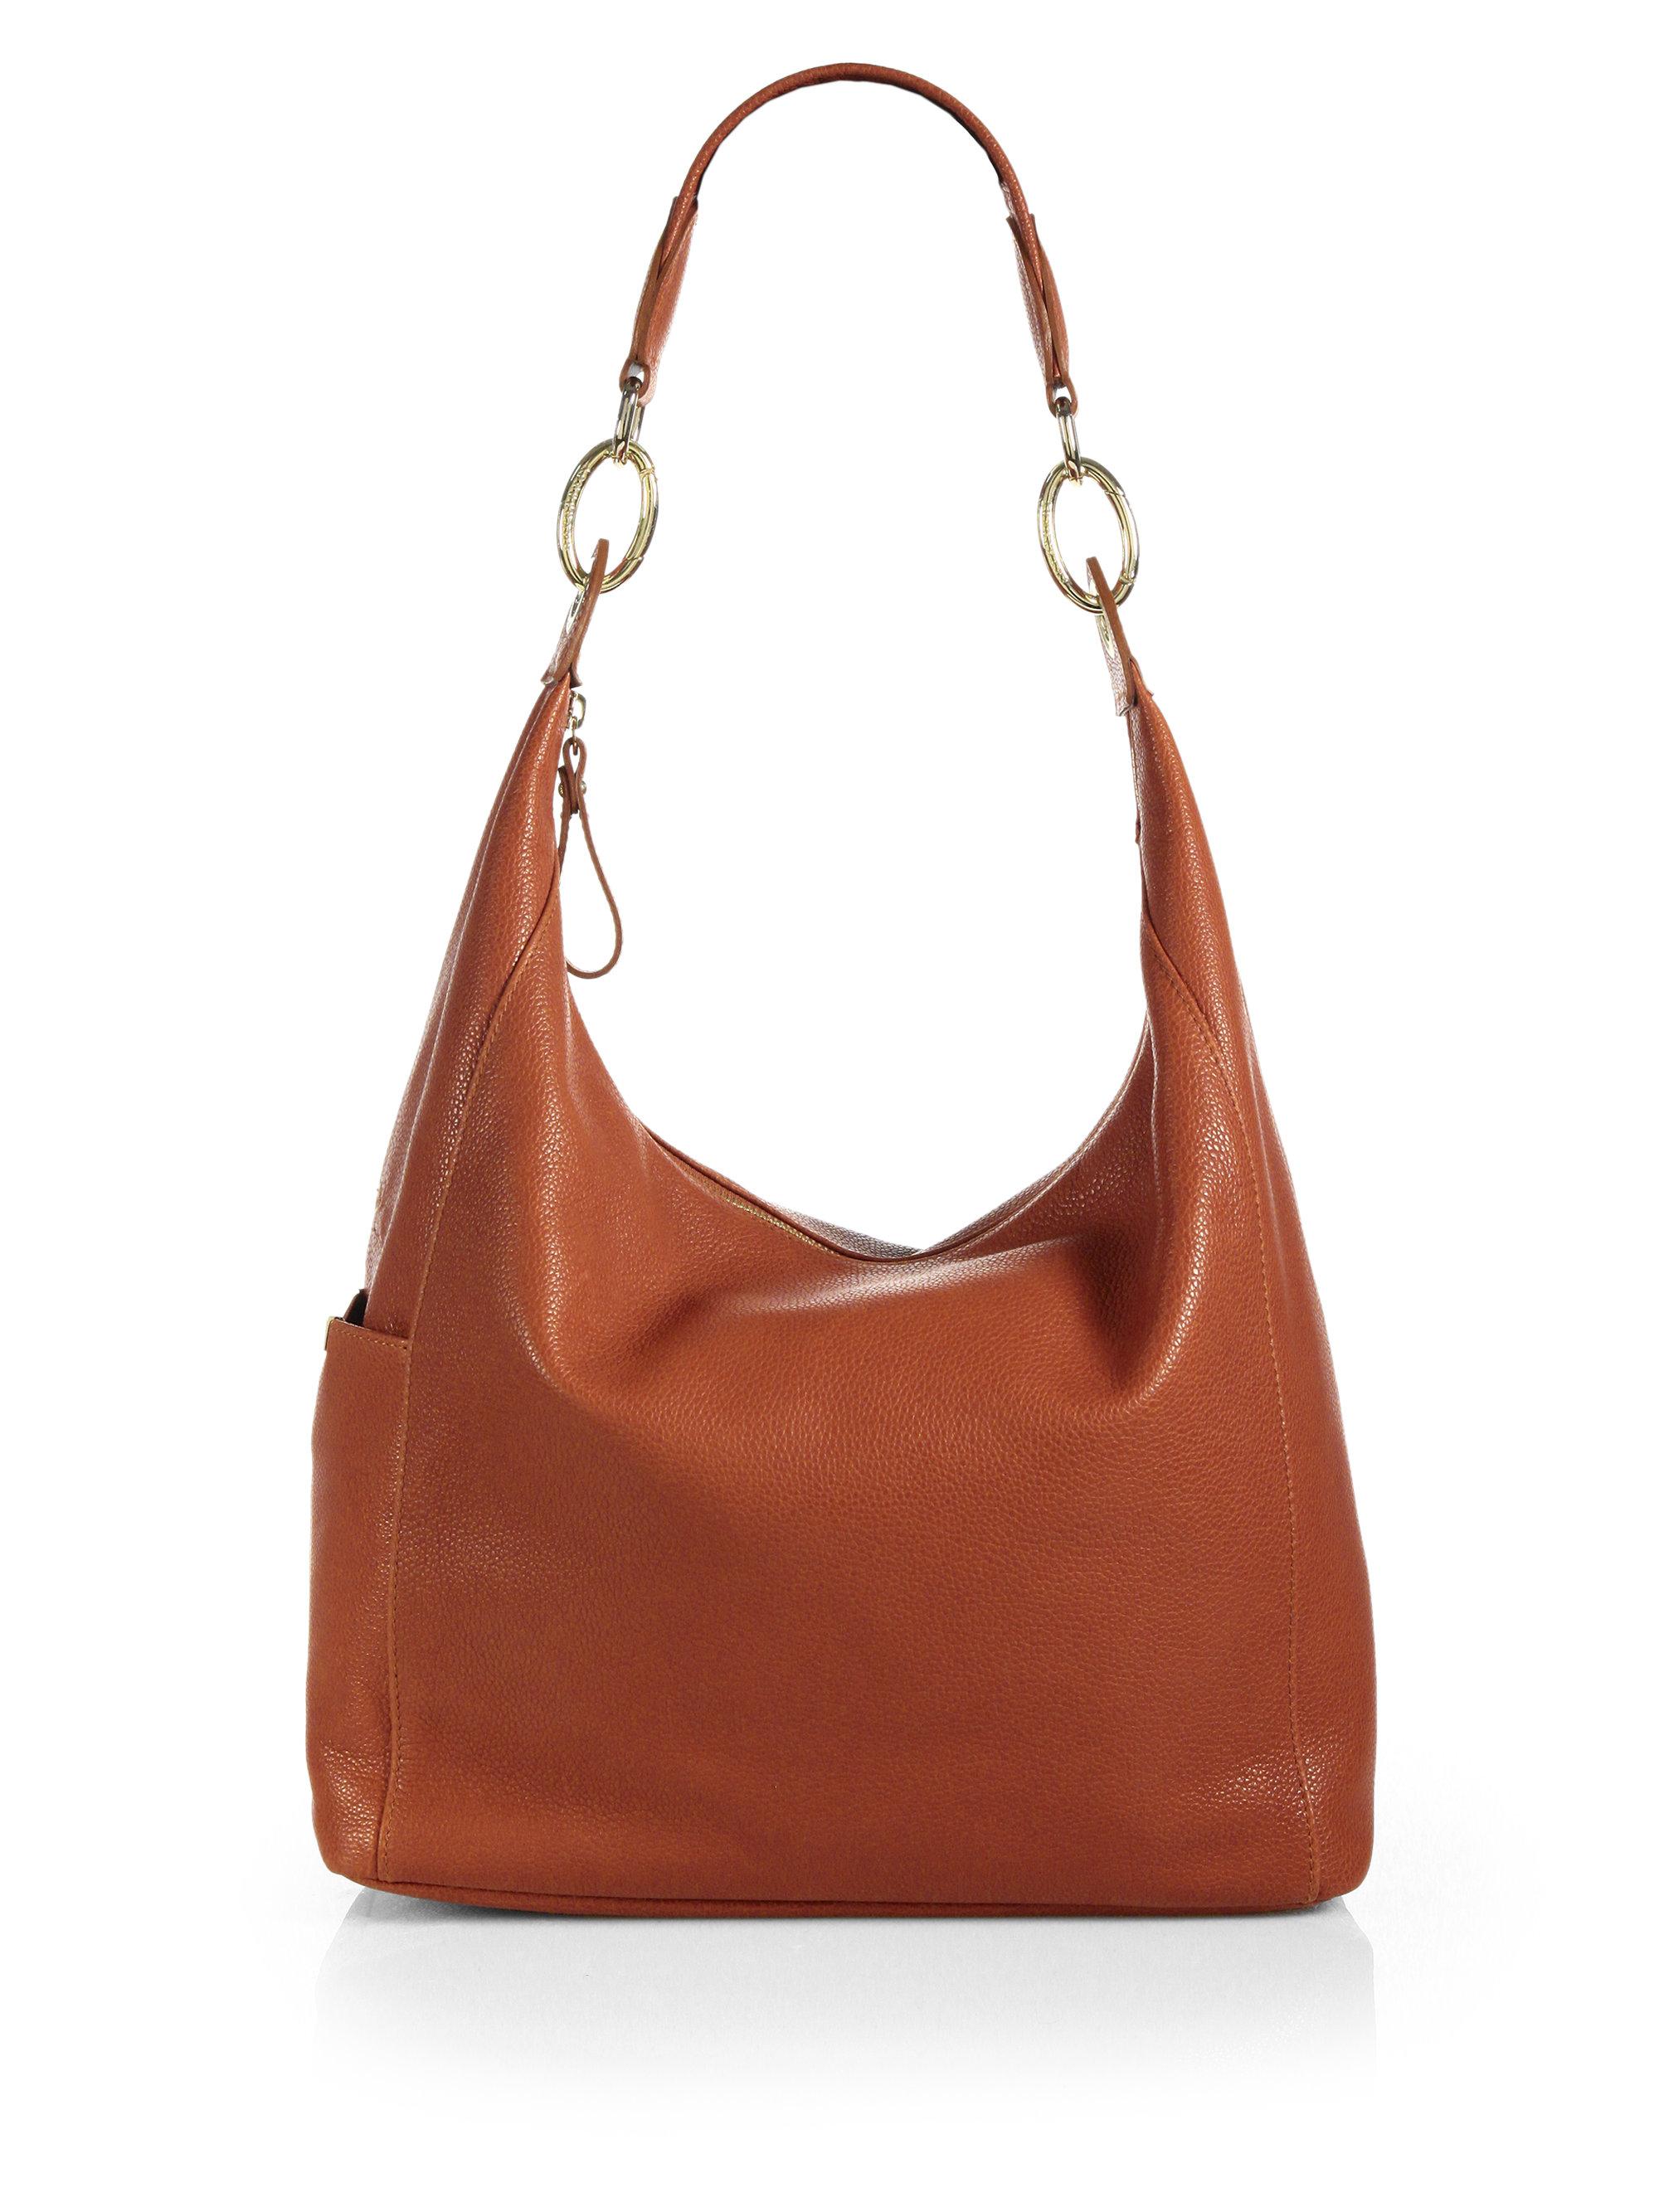 Longchamp Le Foulonn & #233 Hobo Bag in Brown | Lyst